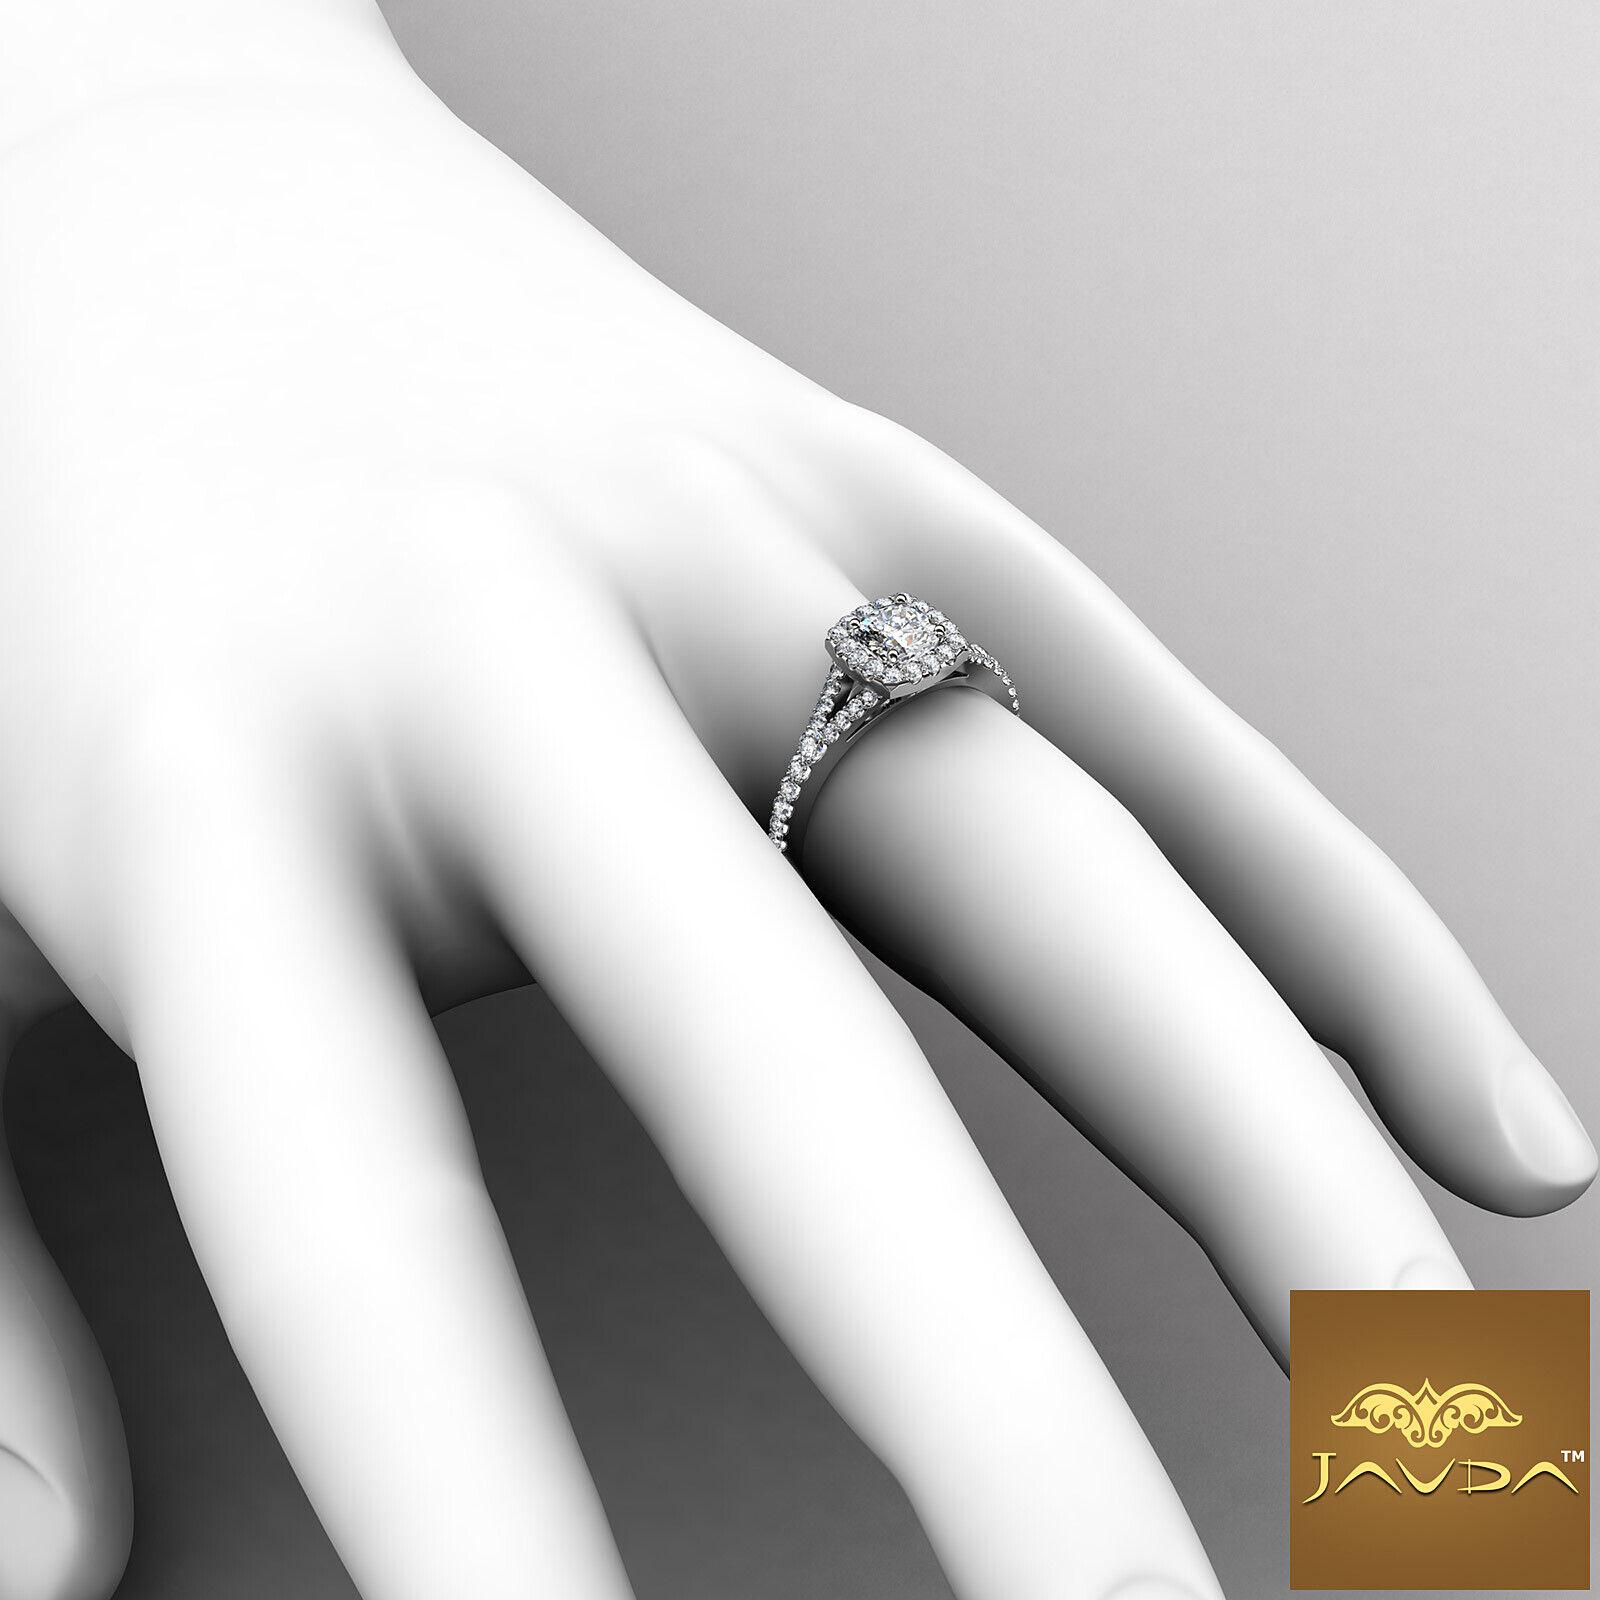 Cushion Shape Diamond Engagement GIA G VVS2 Halo Pre-Set Ring 18k White Gold 1Ct 4